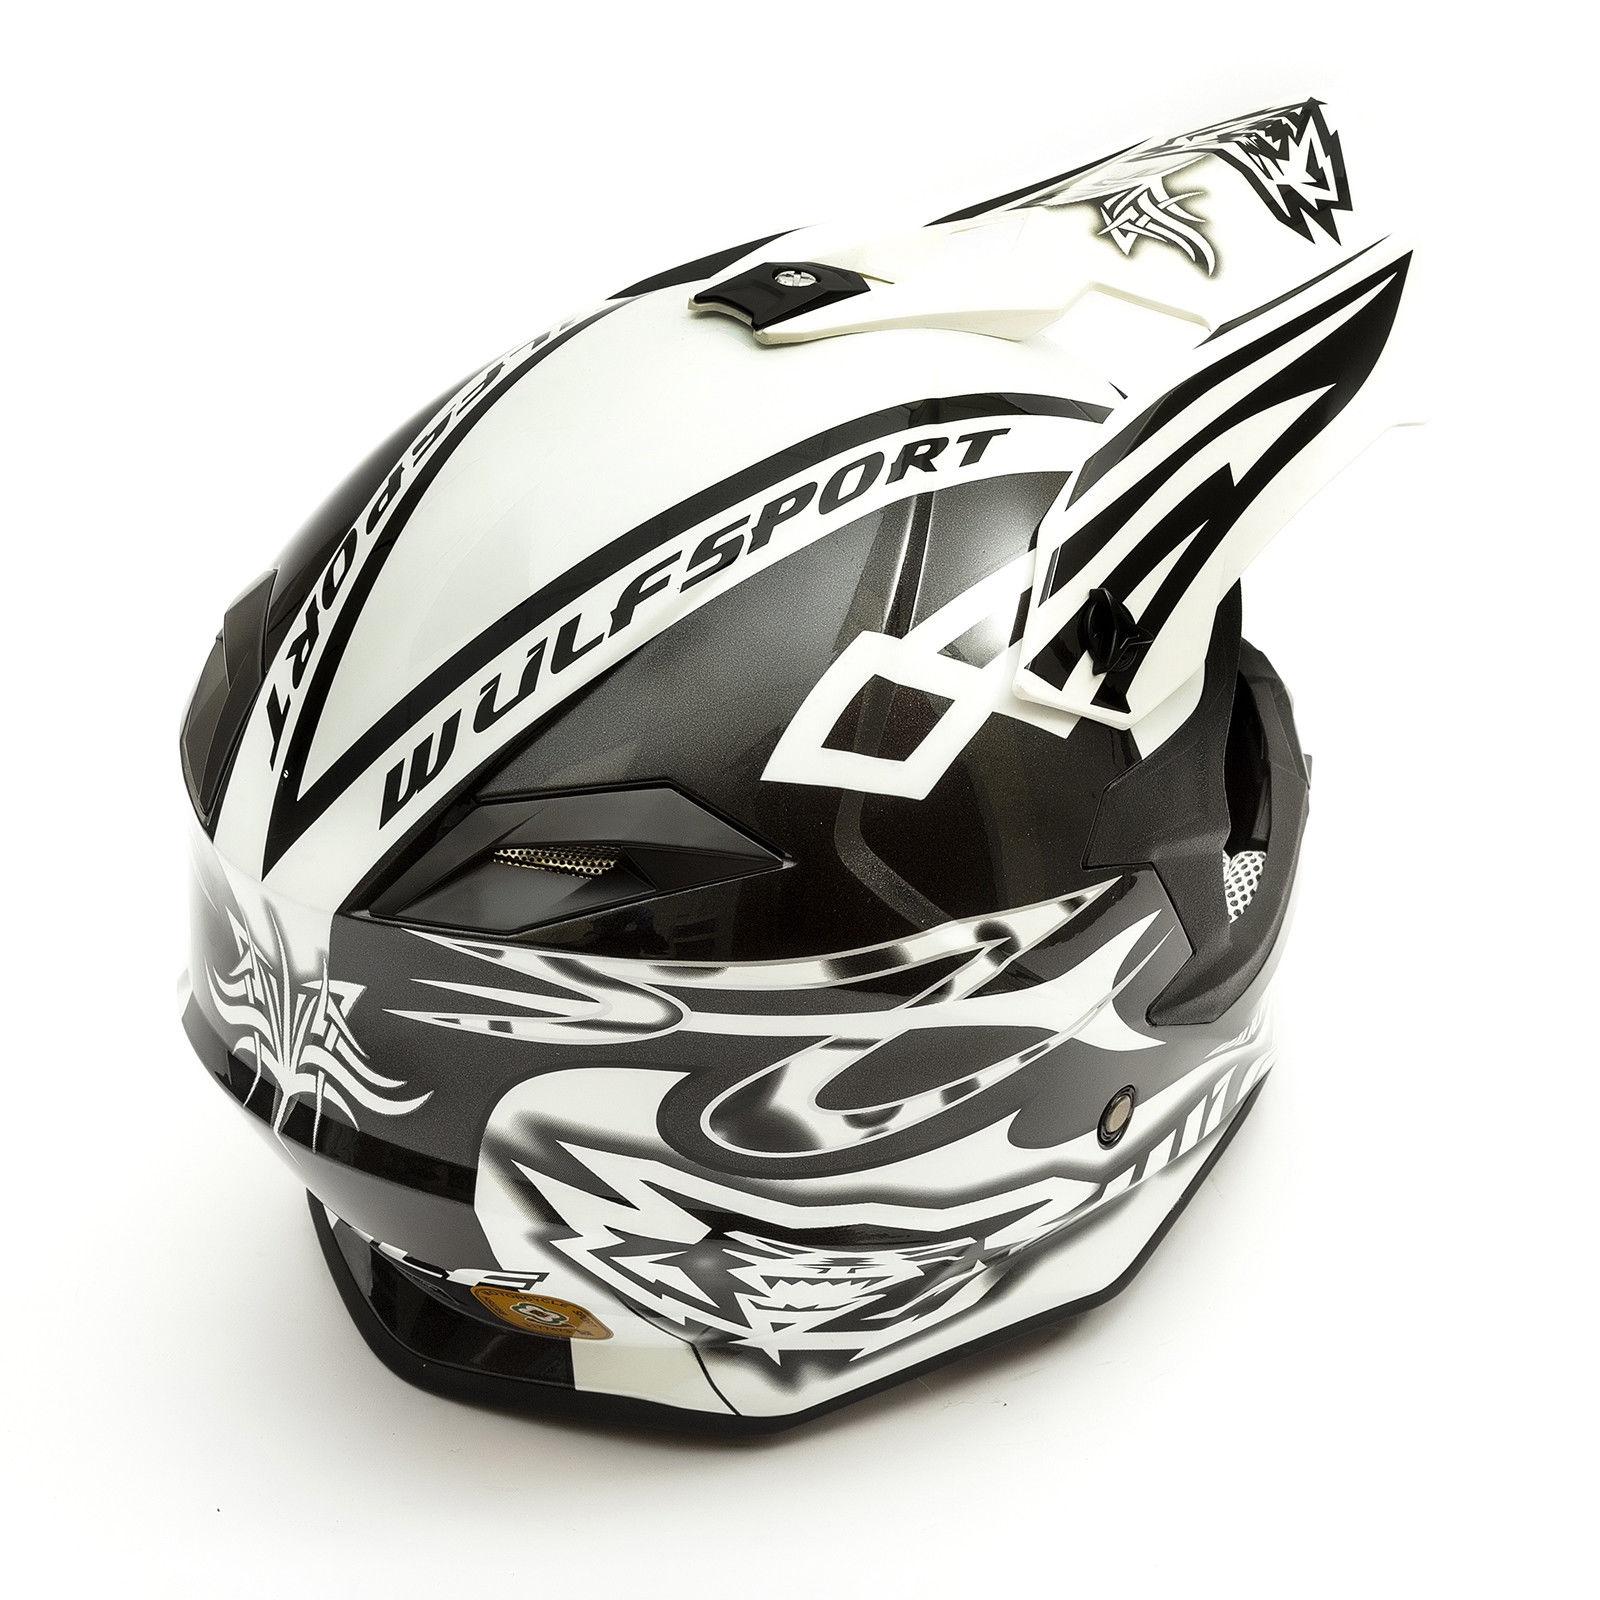 Wulfsport-Adult-Sceptre-Helmets-Motocross-Pitbike-Motorbike-Off-Road-Racing-ATV thumbnail 55